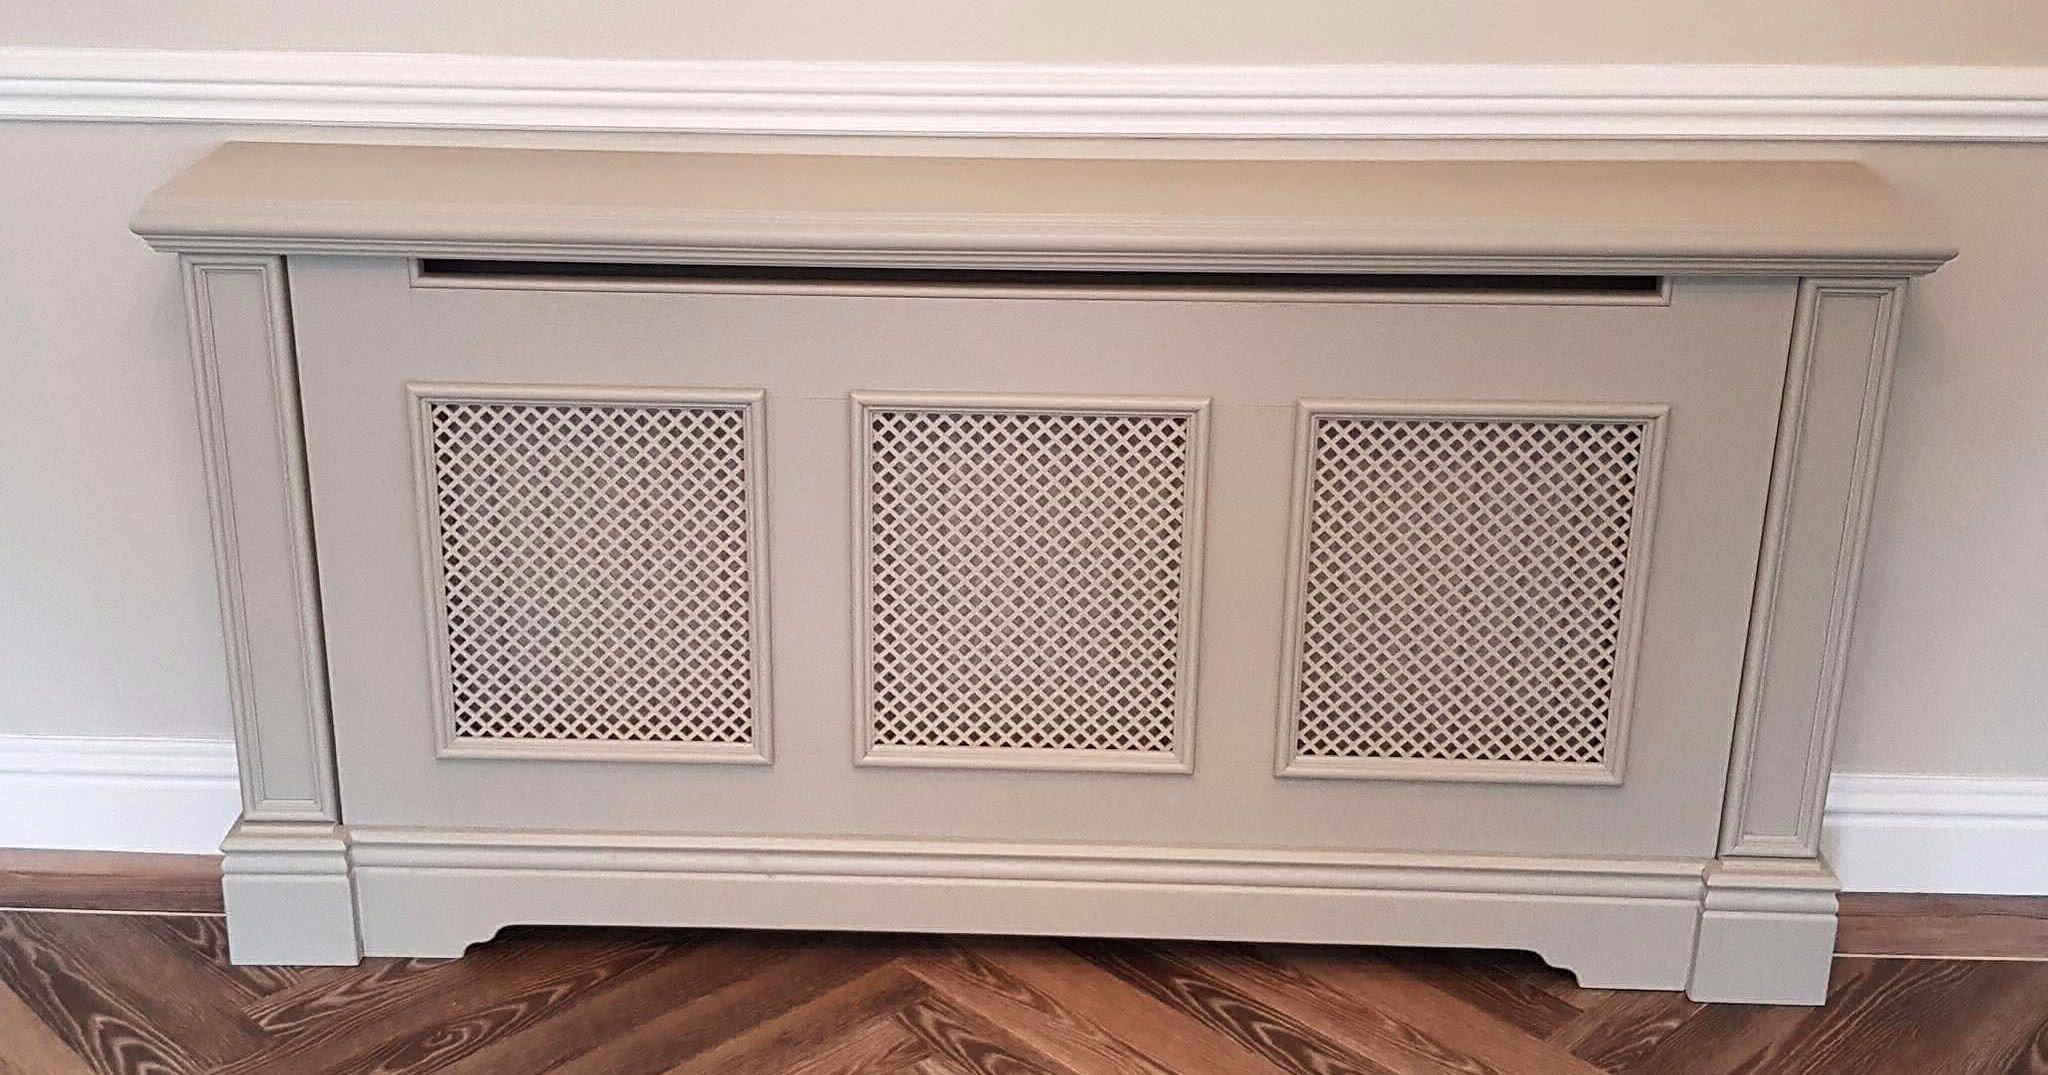 radiator covers ireland woodies Custom radiator covers